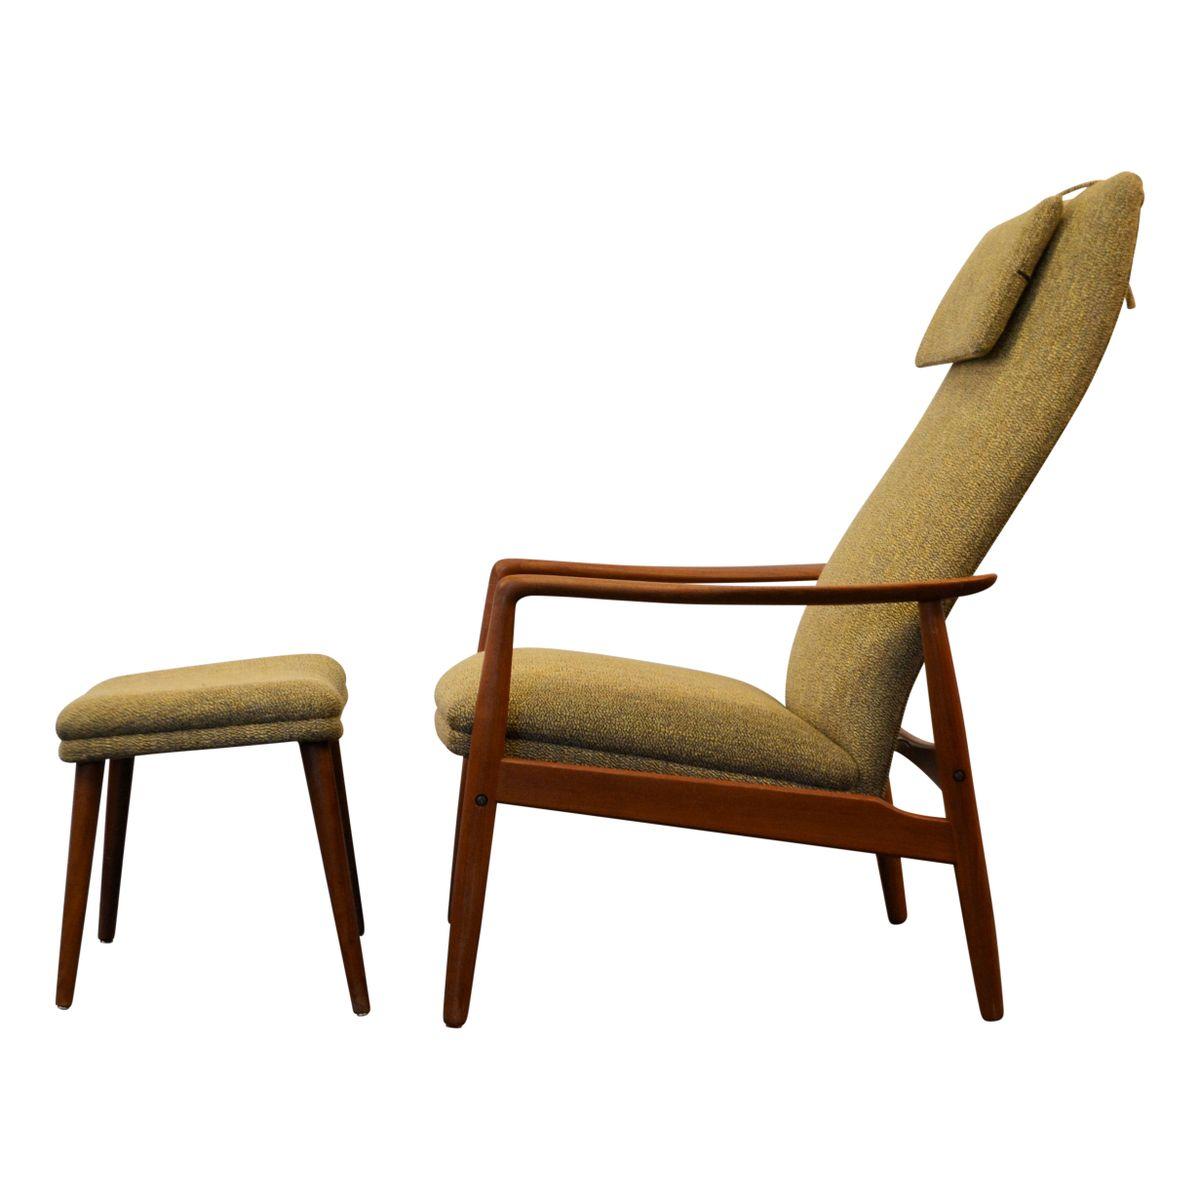 Vintage Teak Sessel & Fußhocker von Søren Ladefoged für SL Møbler